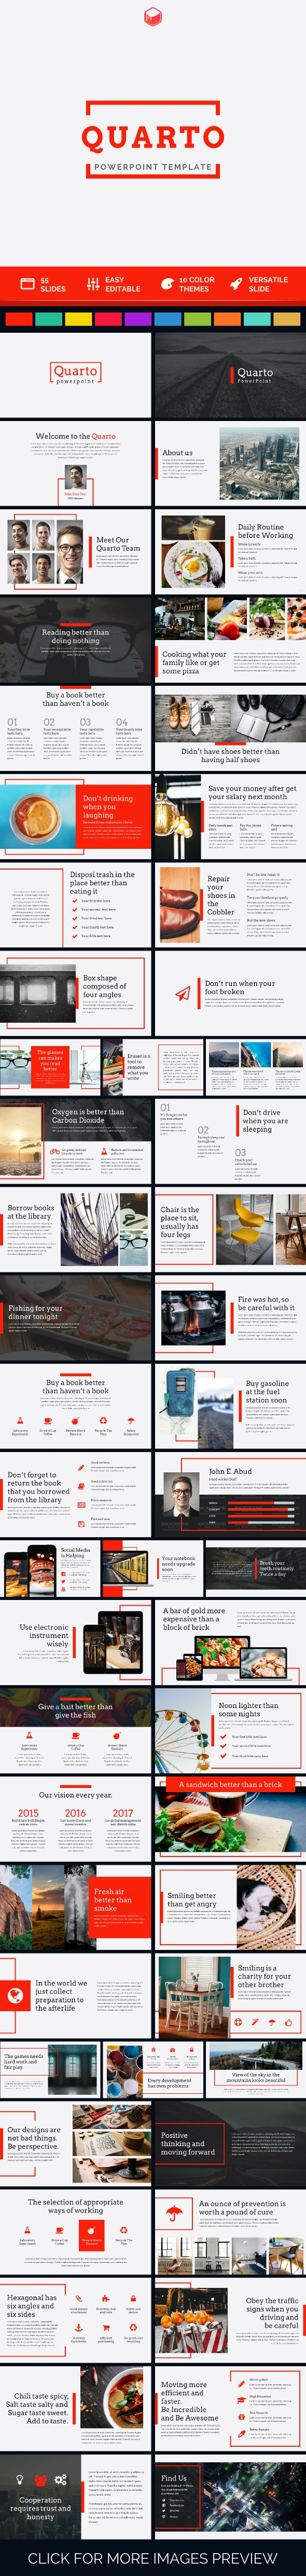 Quarto - PowerPoint Template - PowerPoint Templates Presentation Templates